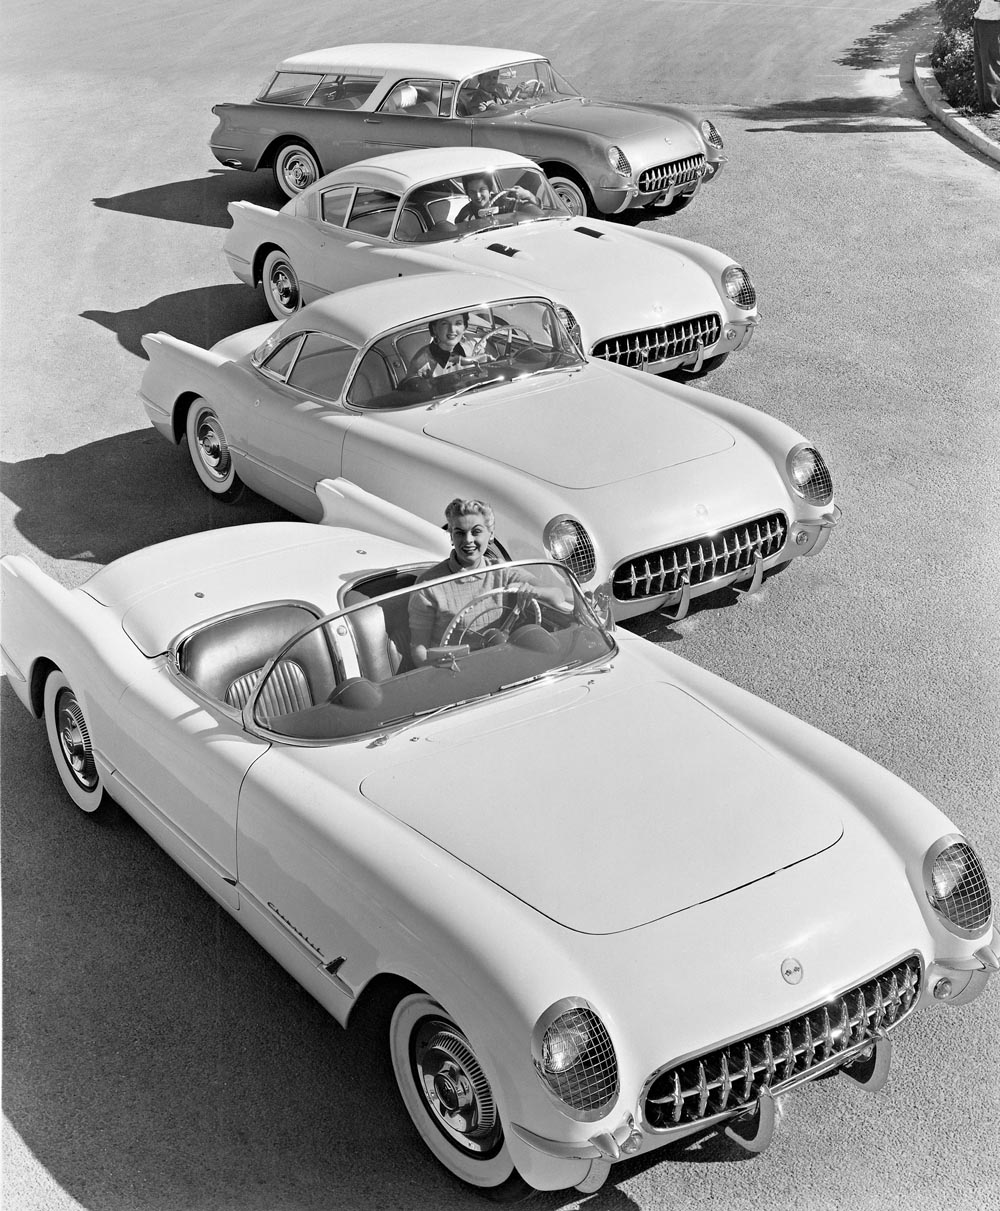 1954 Corvette dream cars - Corvette Corvair fastback, Corvette ...